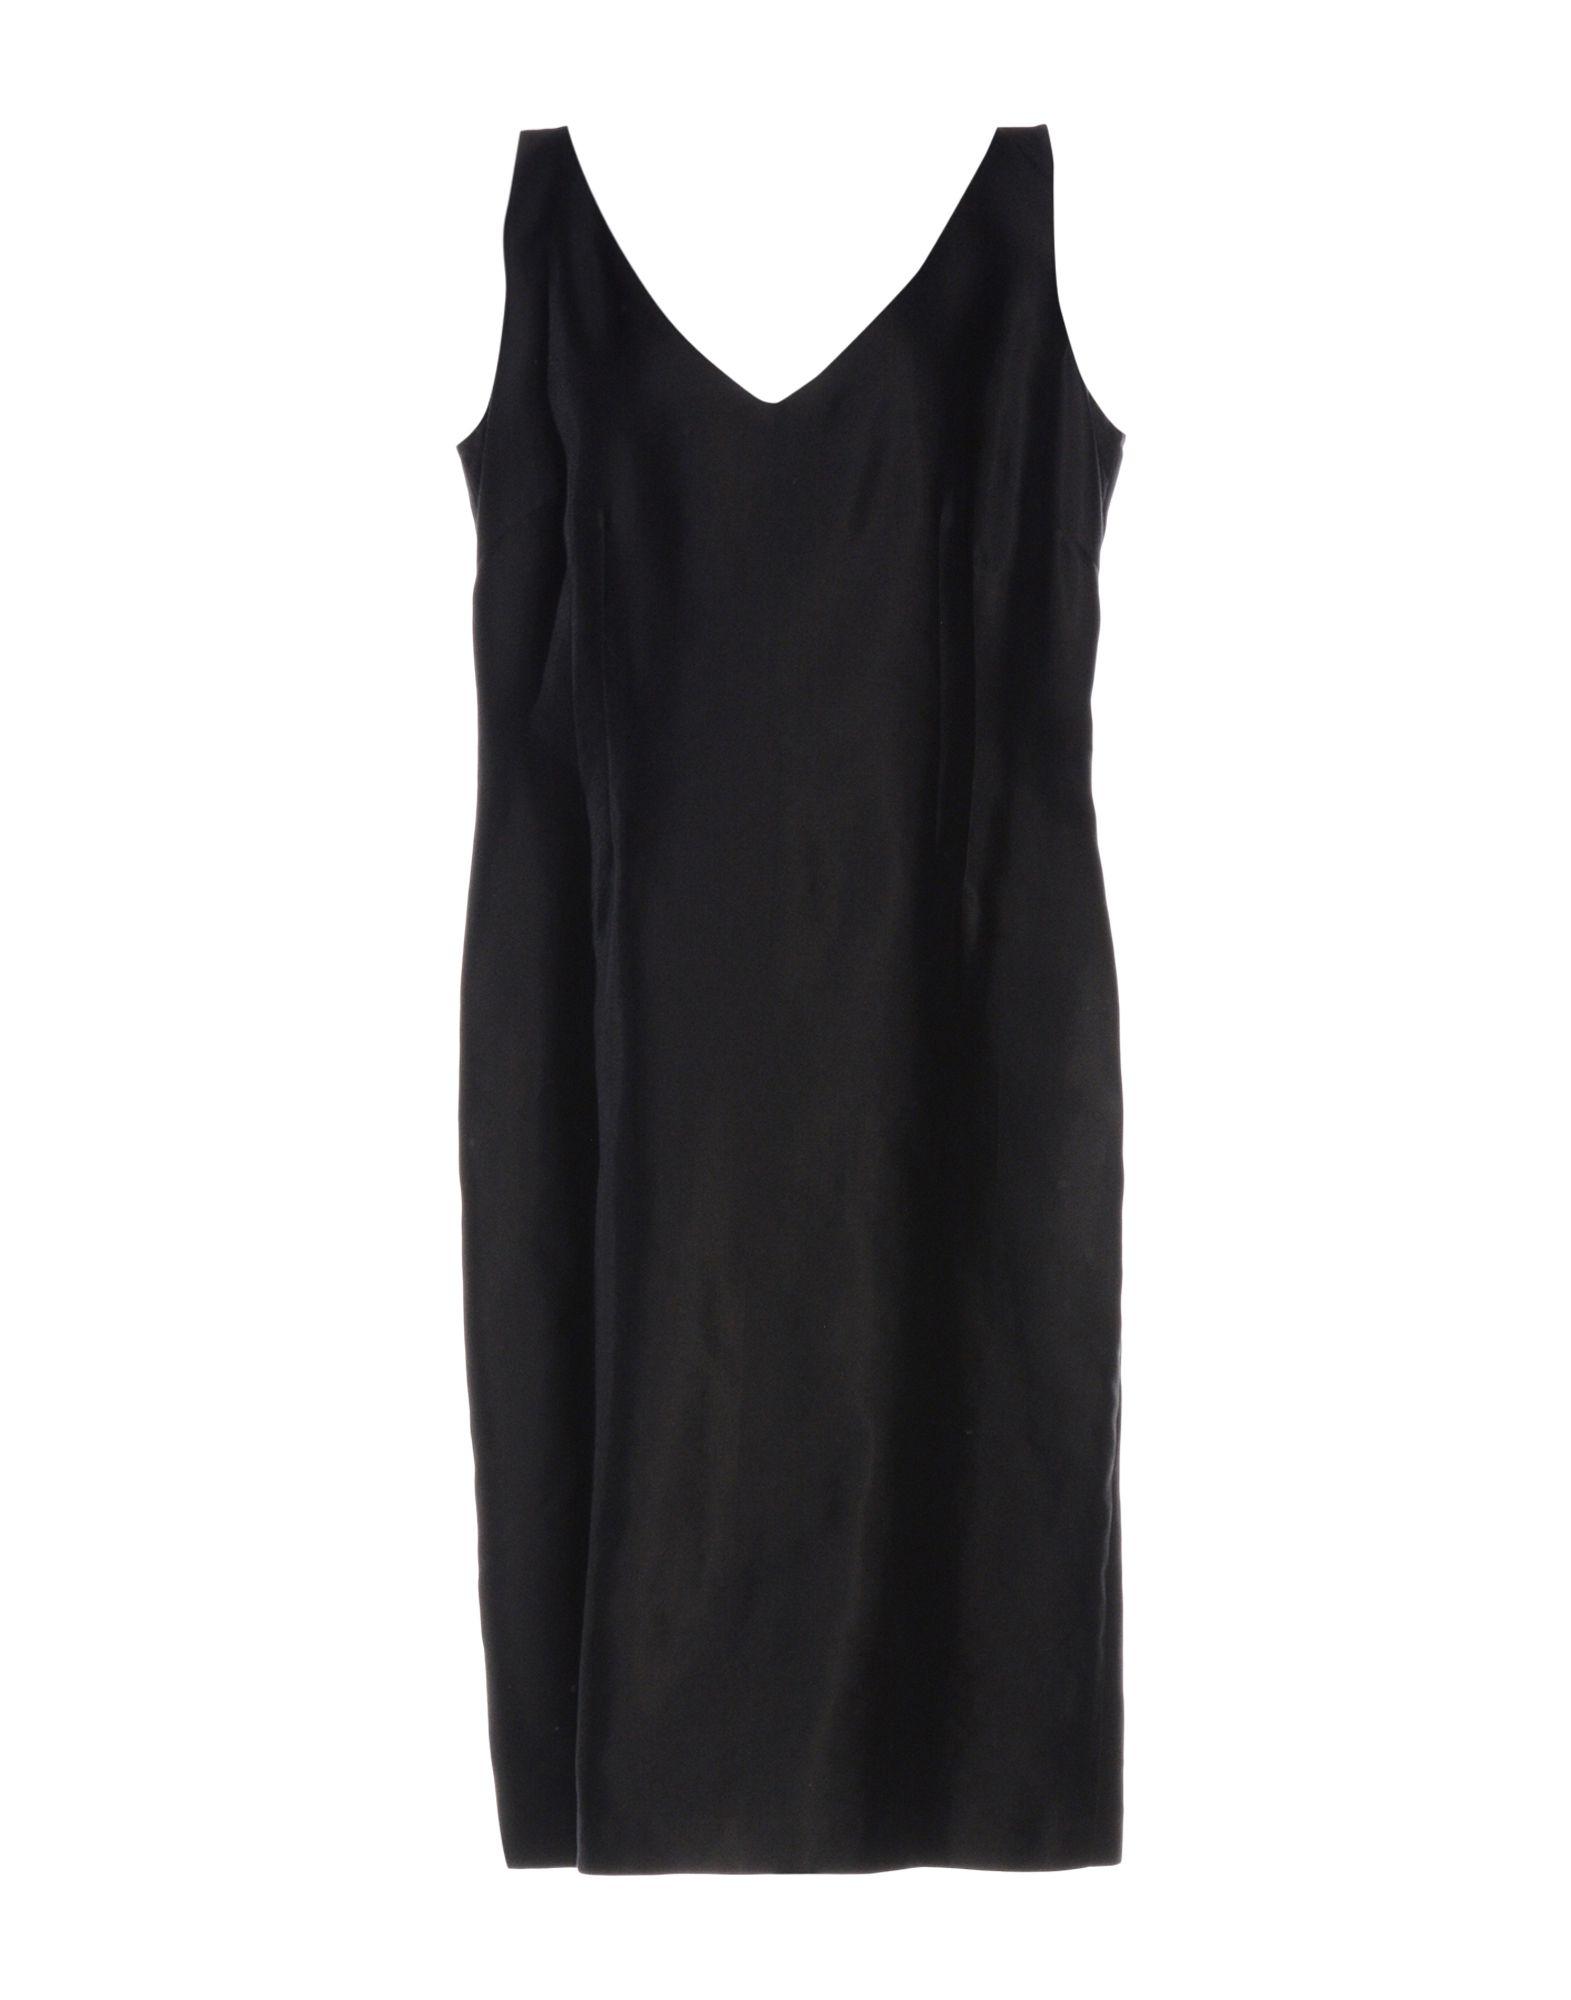 BOTONDI COUTURE Платье длиной 3/4 moschino couture юбка длиной 3 4